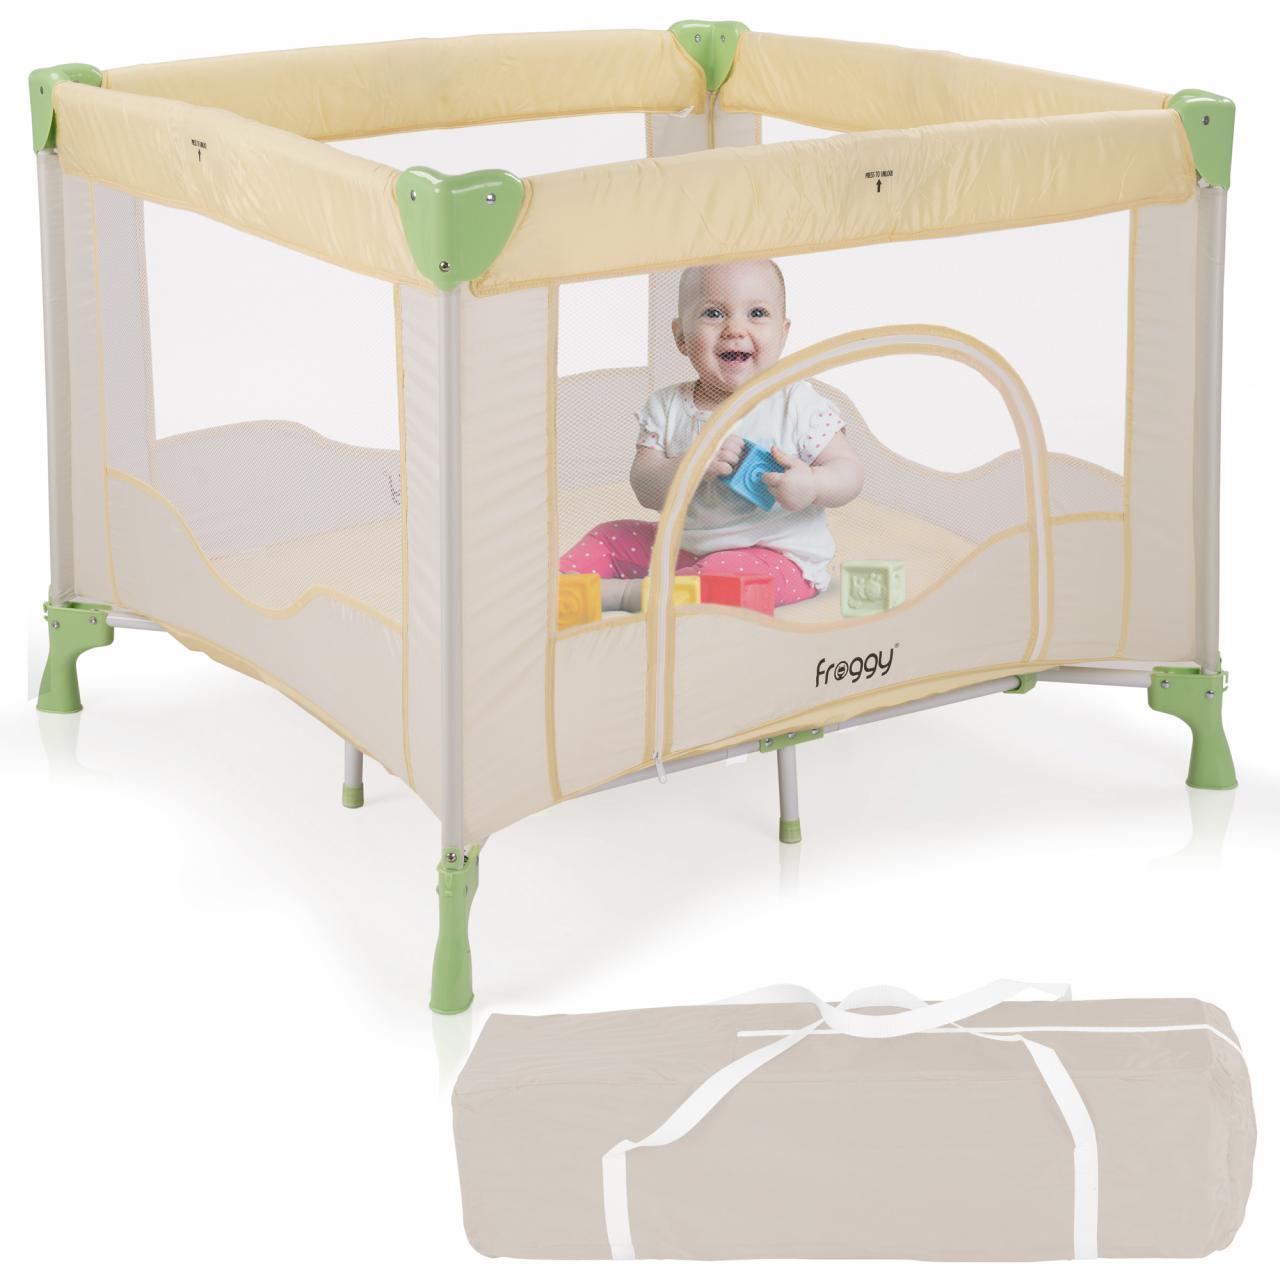 Reisebett Kinderreisebett Babyreisebett Laufstall Kinderbett Spielstall Babybett